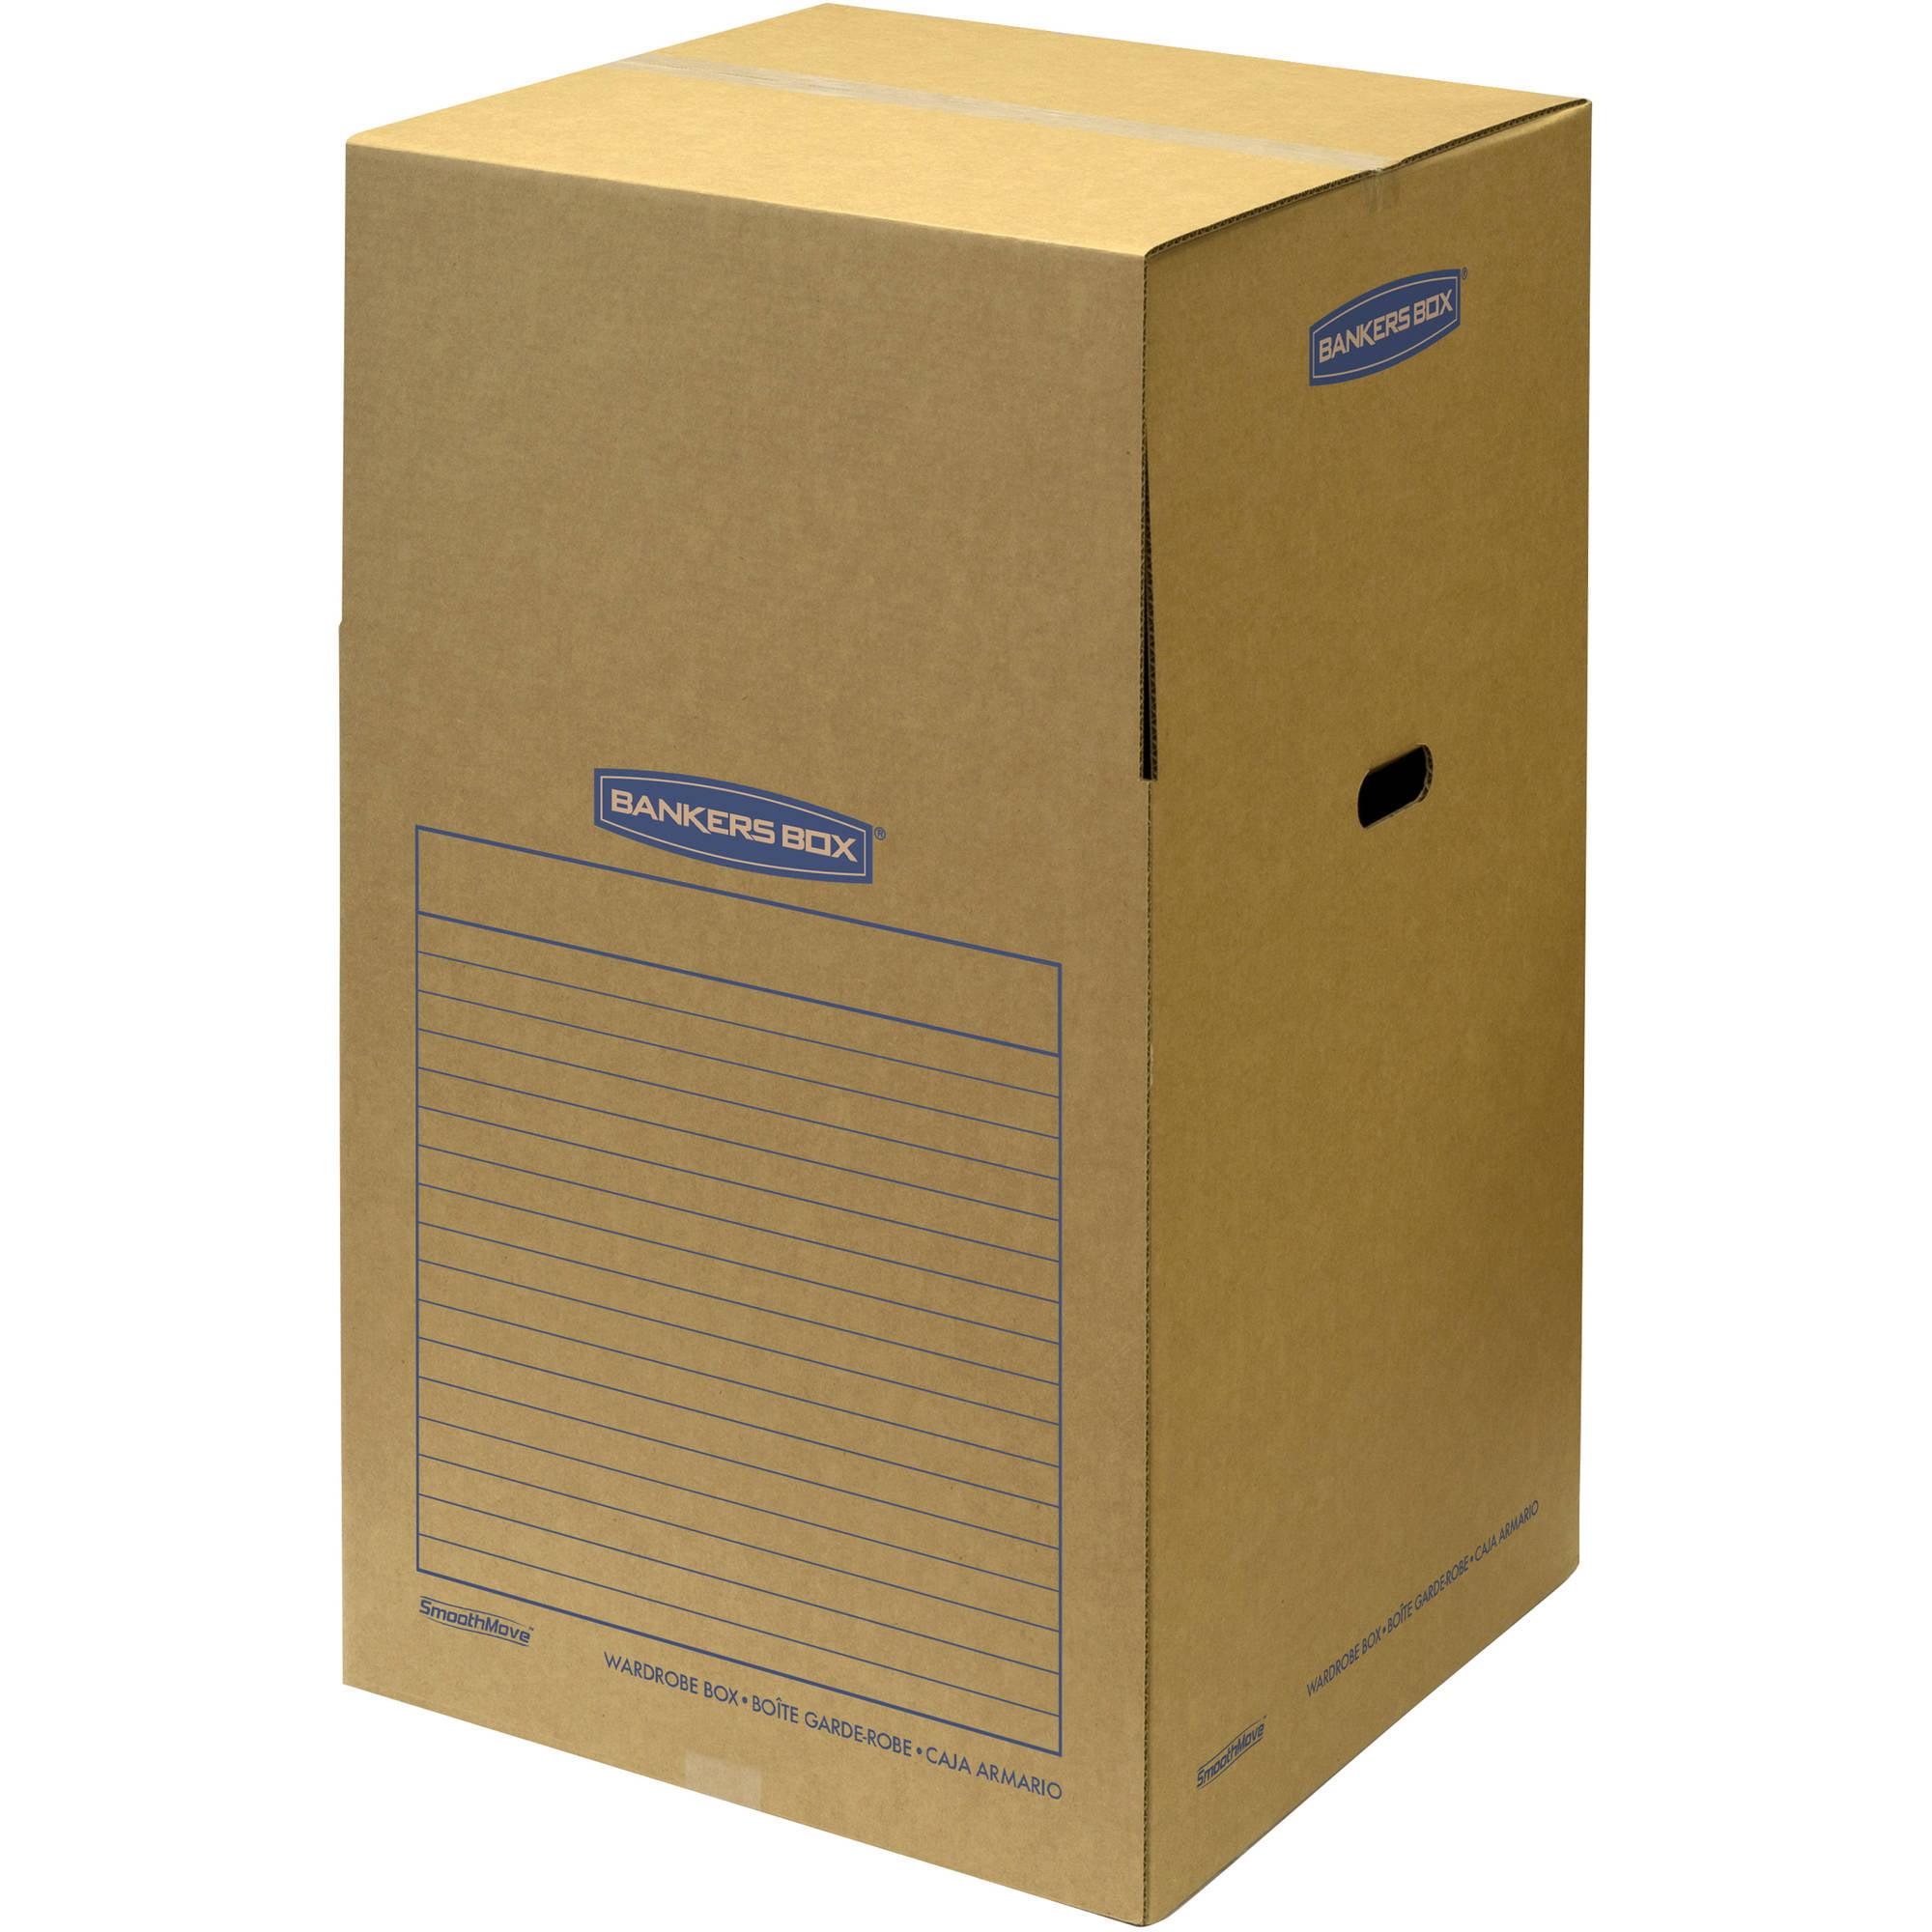 oz of x wardrobe walmart moving damprid boxes fresh hanging absorber moisture satisfying scent